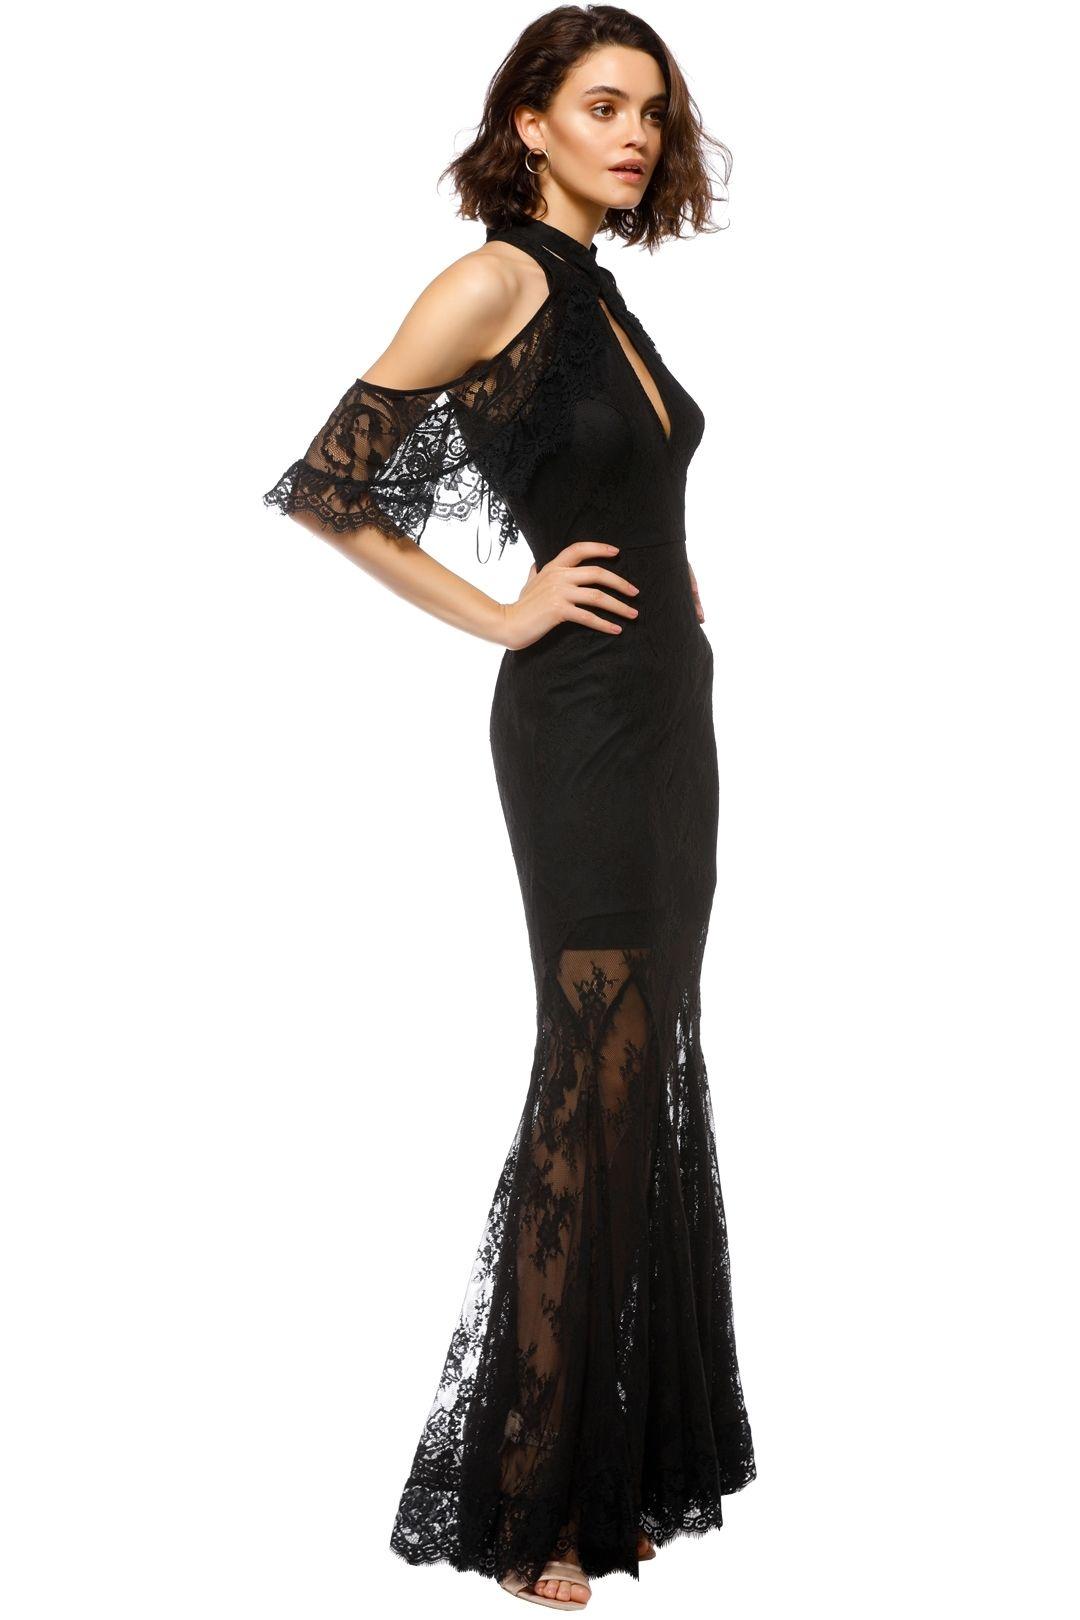 Talulah - Blind Love Gown - Black - Side